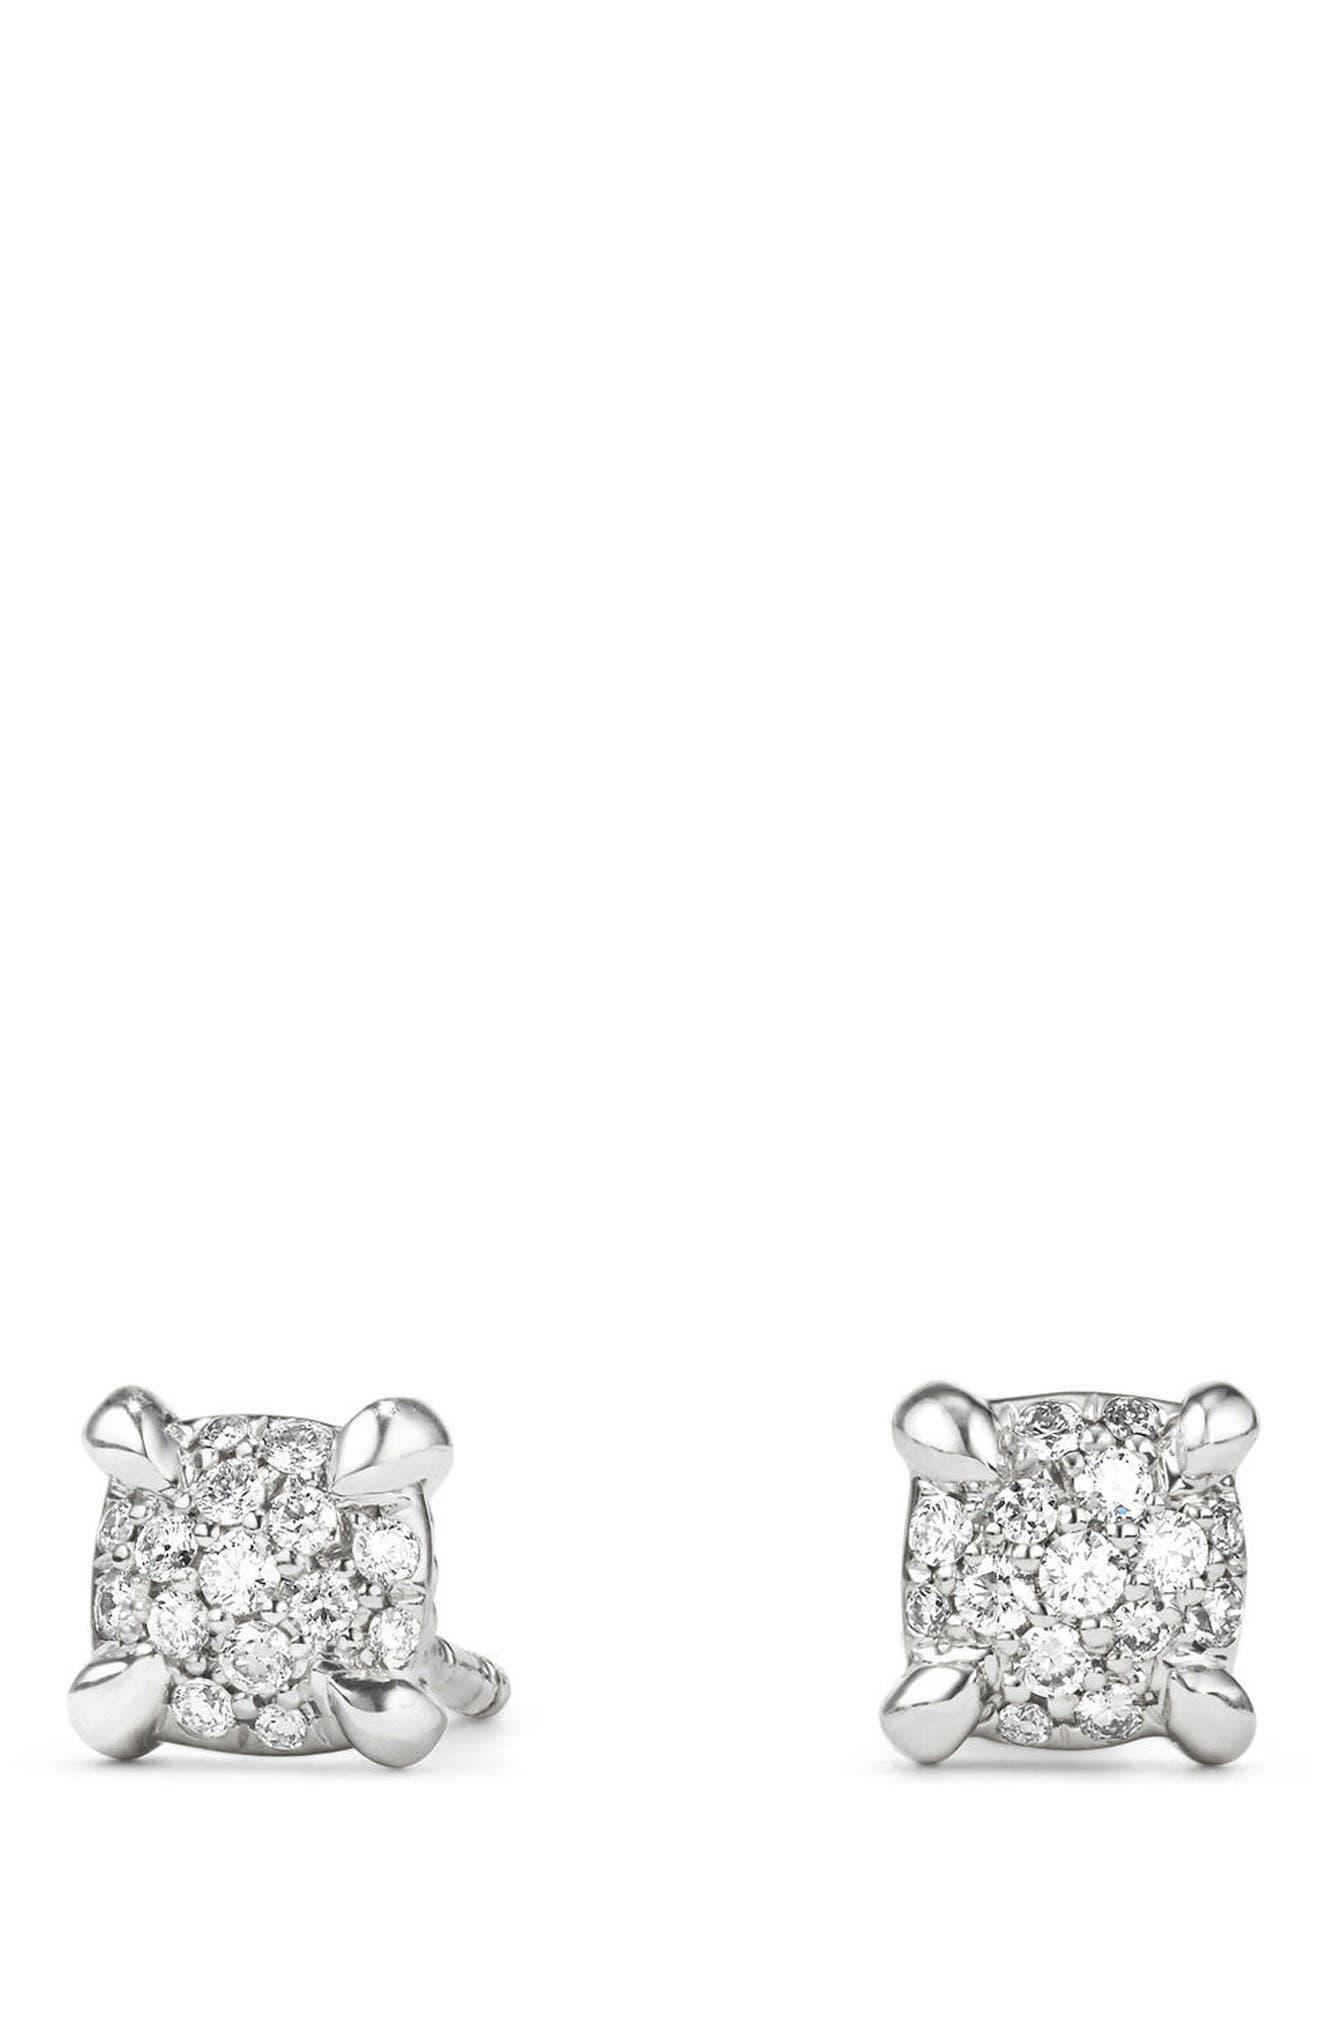 Châtelaine Stud Earrings with Diamonds,                         Main,                         color, 710